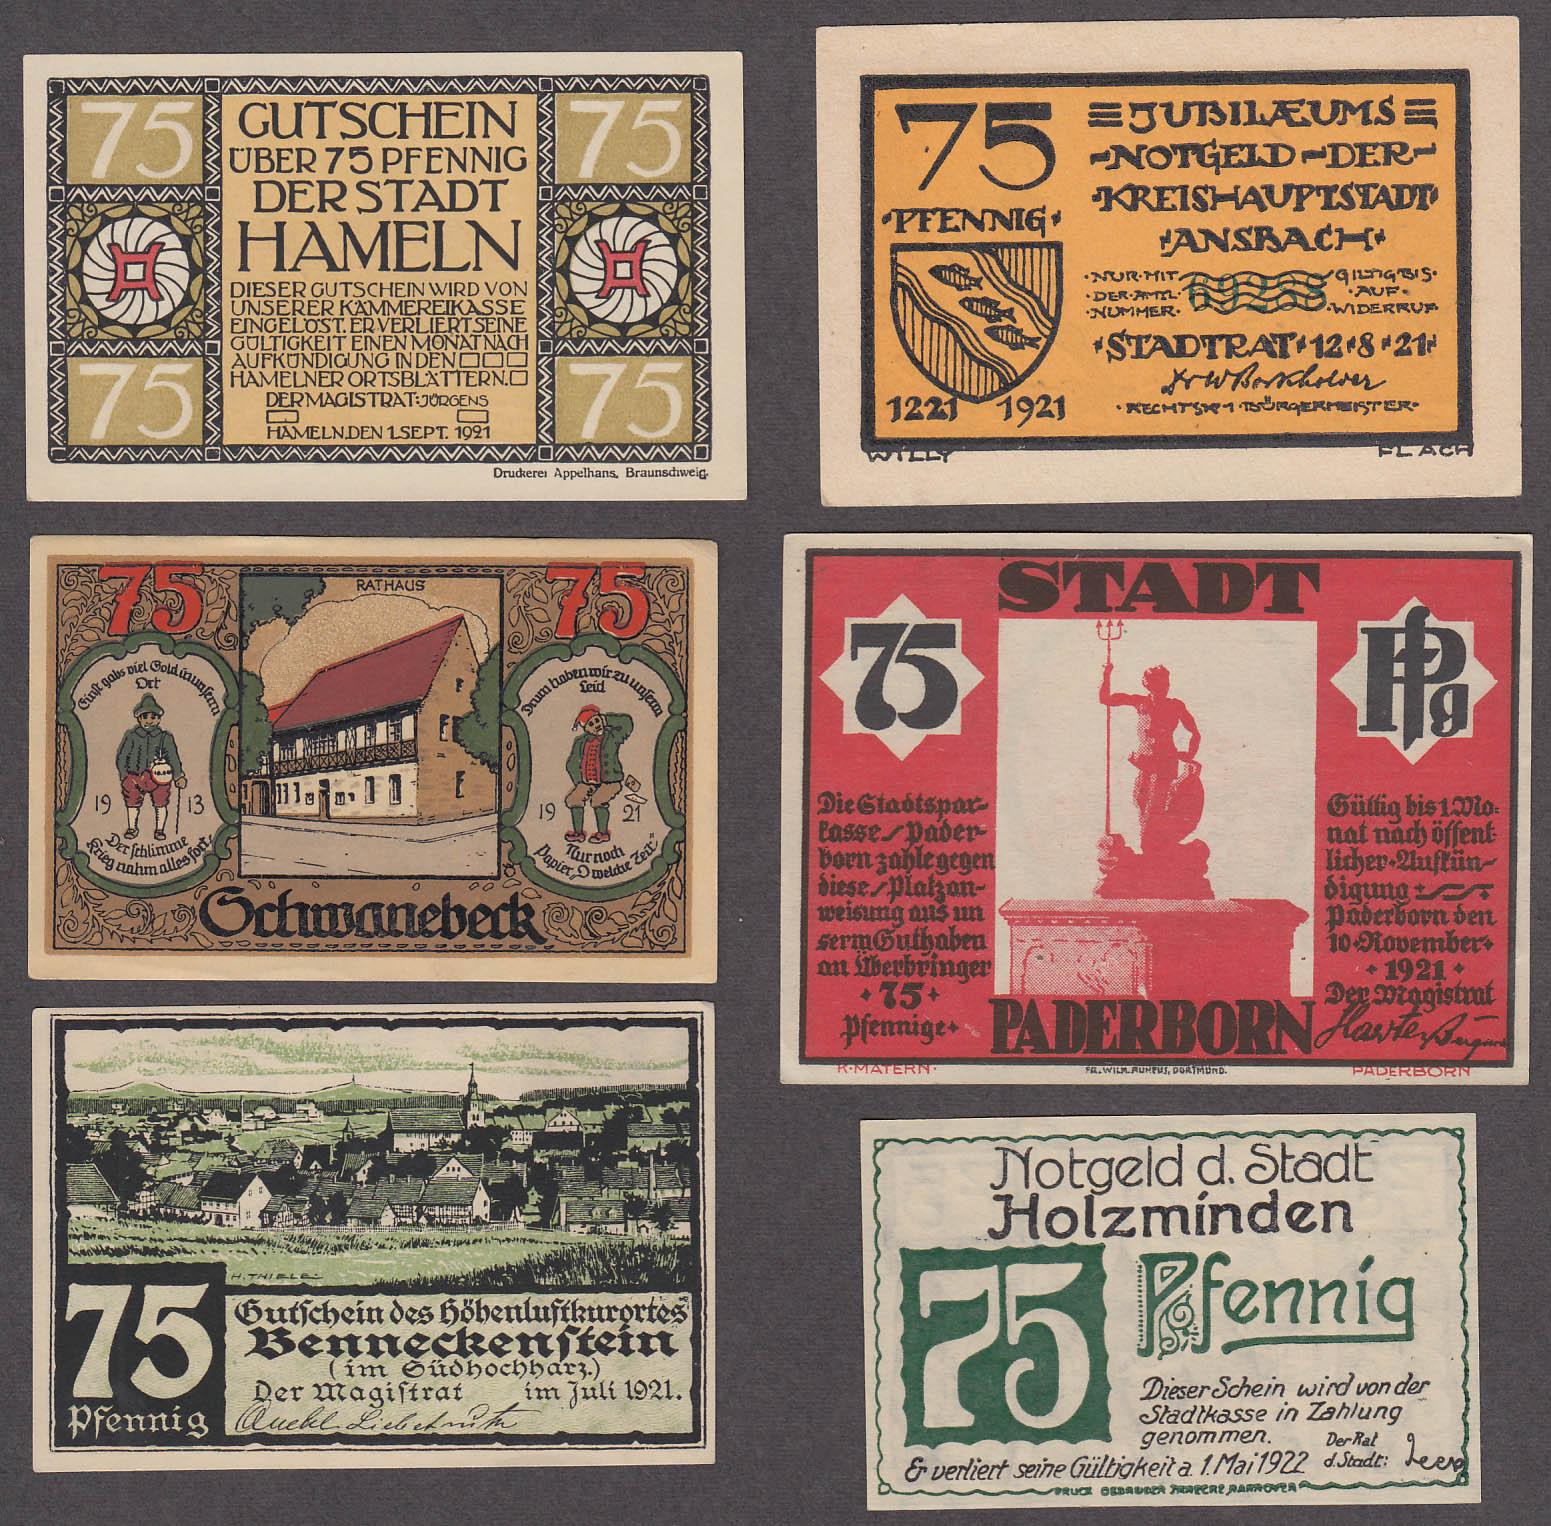 Lot of SIX 75 Pfennig Token-Notes Bank Notes Notgeld Germany 1921 Lot #1